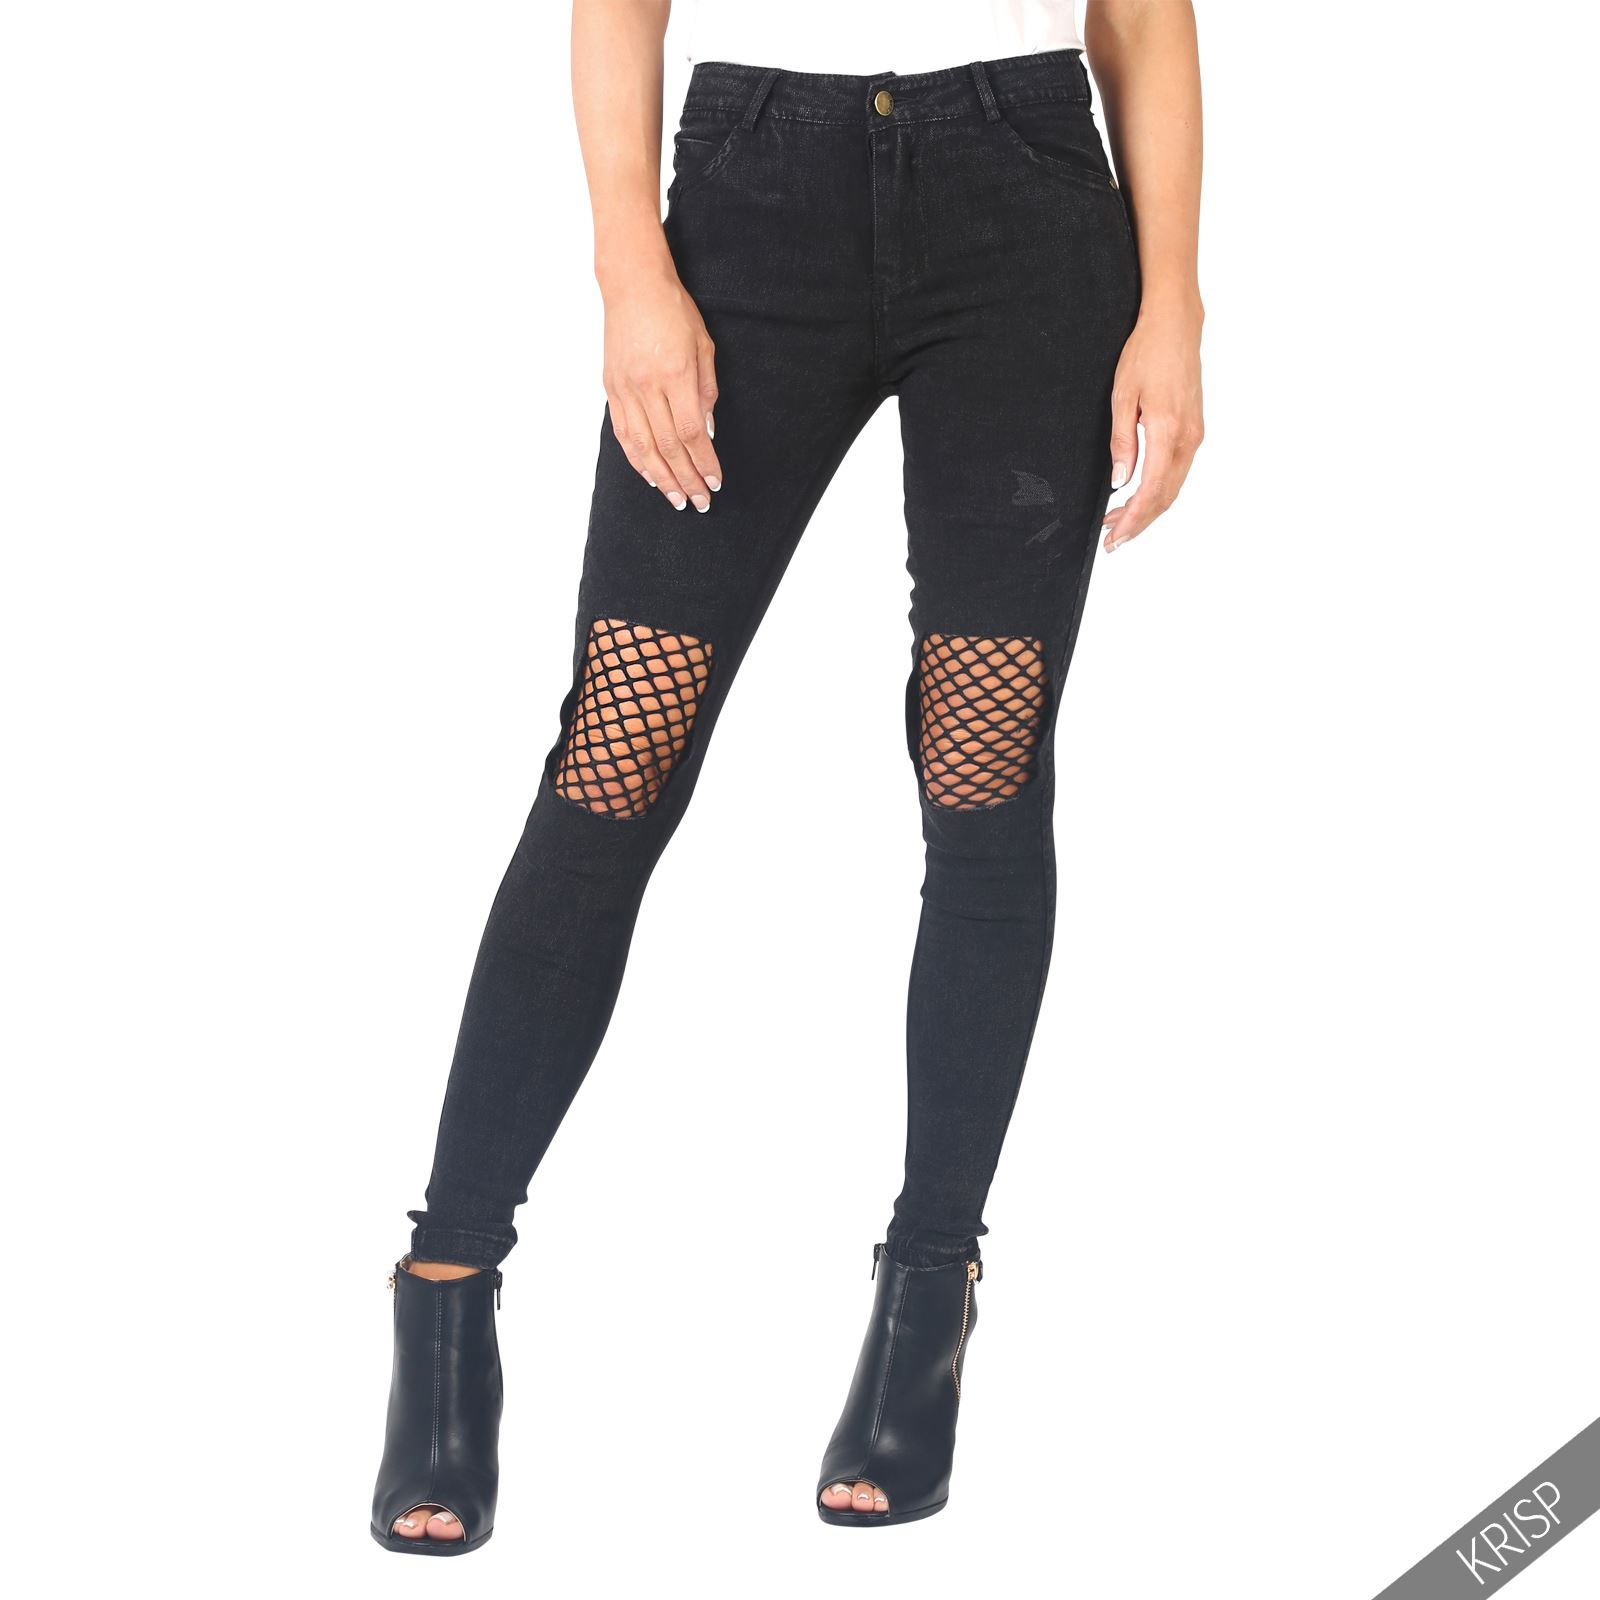 skinny jeans with cut knees super jeans in dieser saison. Black Bedroom Furniture Sets. Home Design Ideas